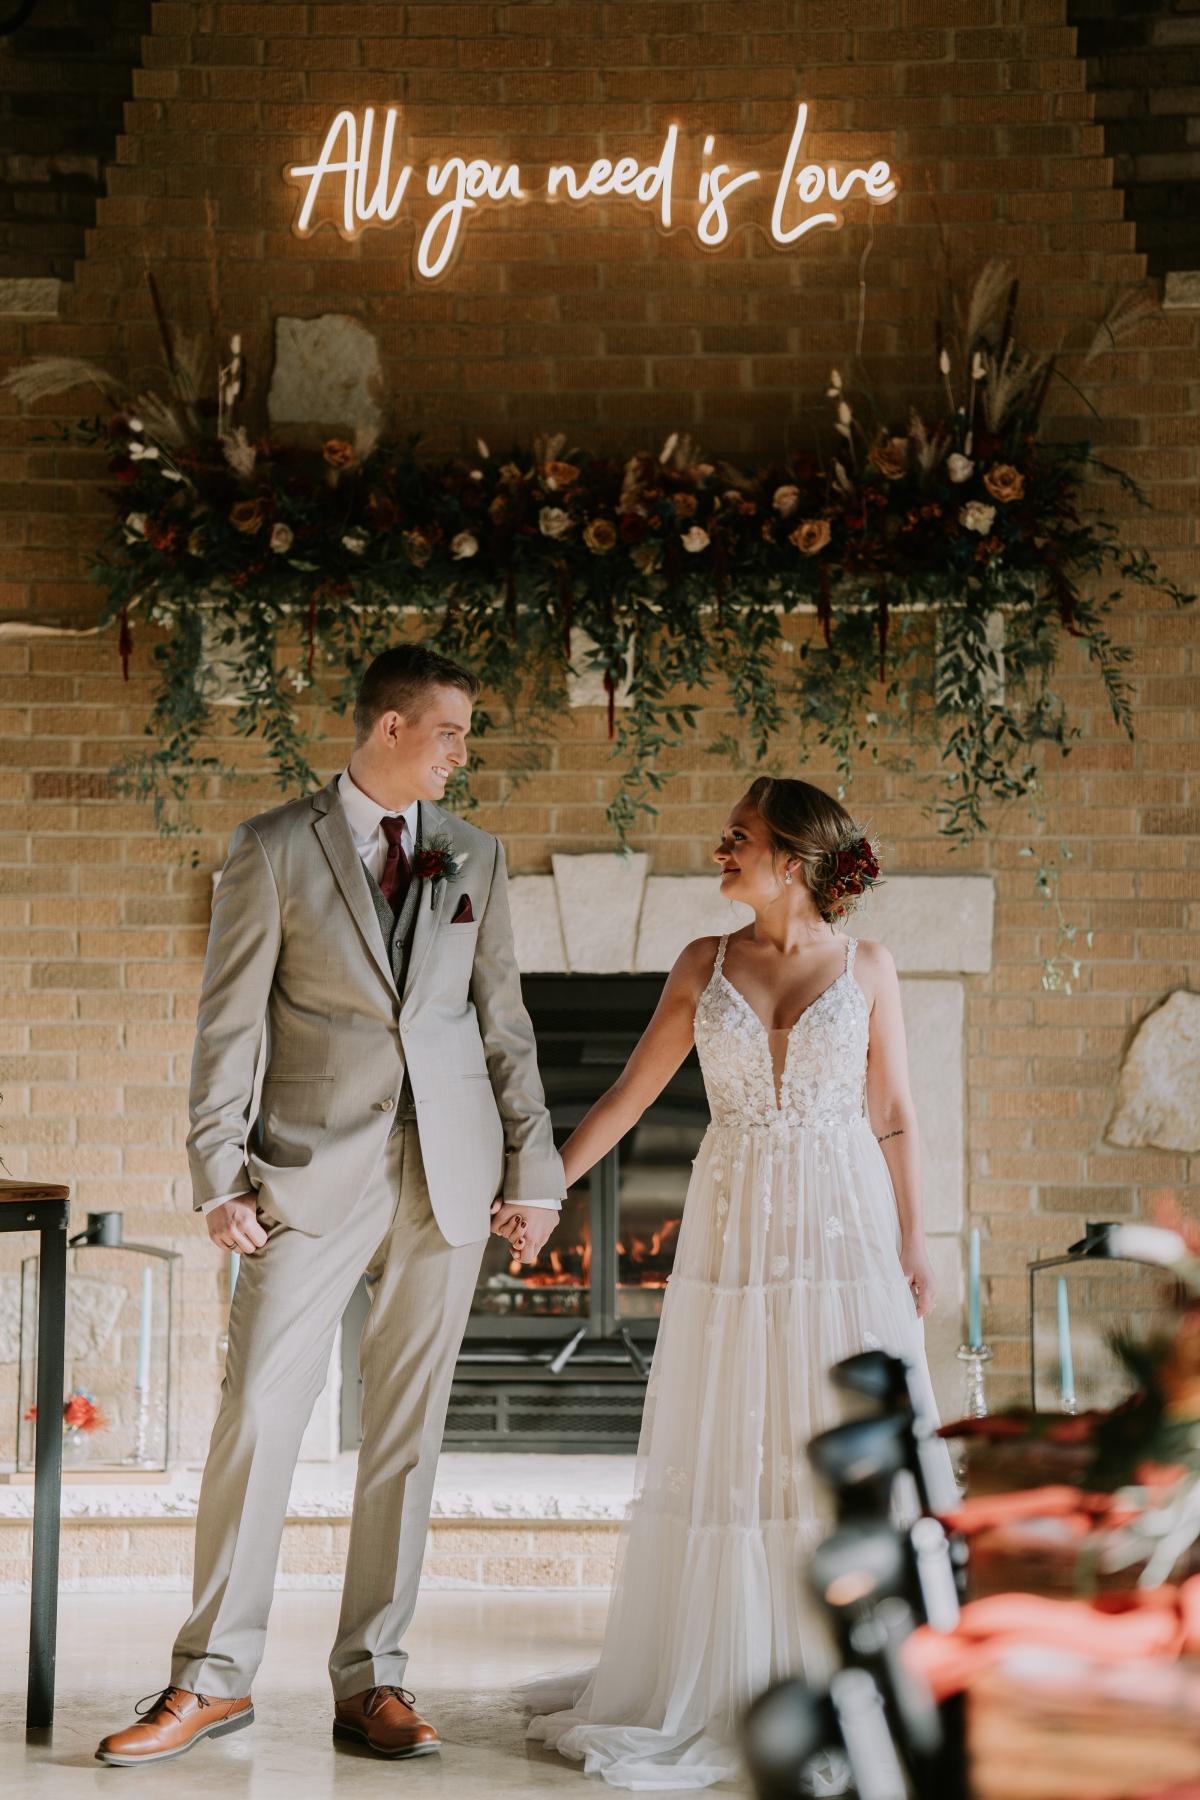 Millennium Moments Chicago Wedding Photographer 12